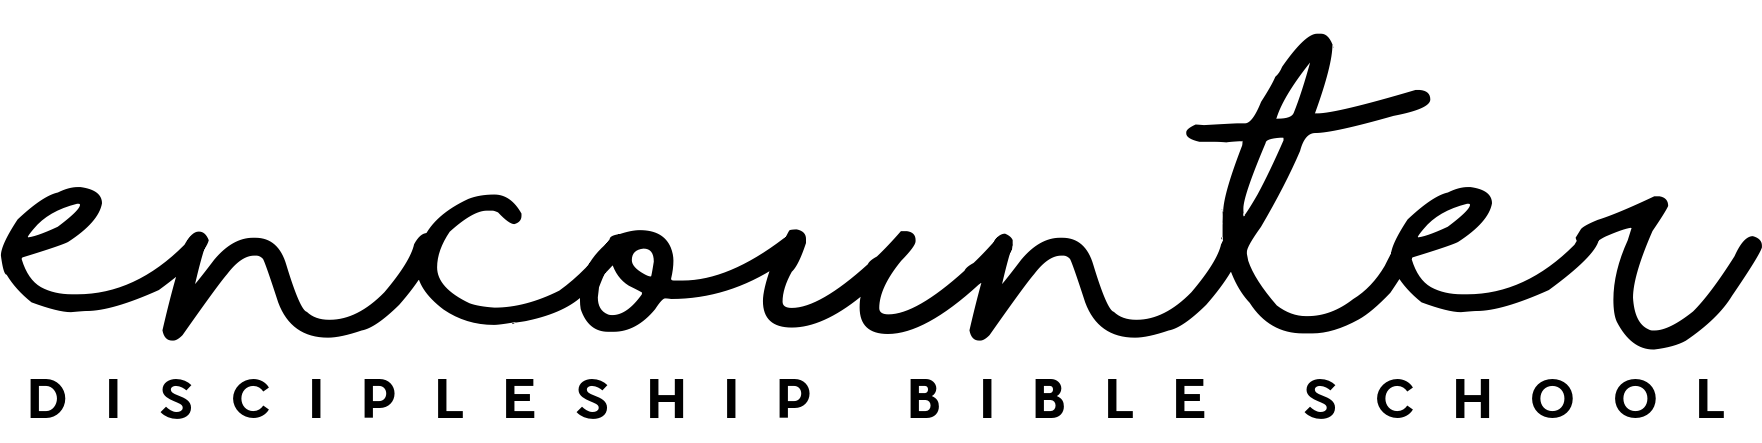 ecnounterdbslogoblack.png